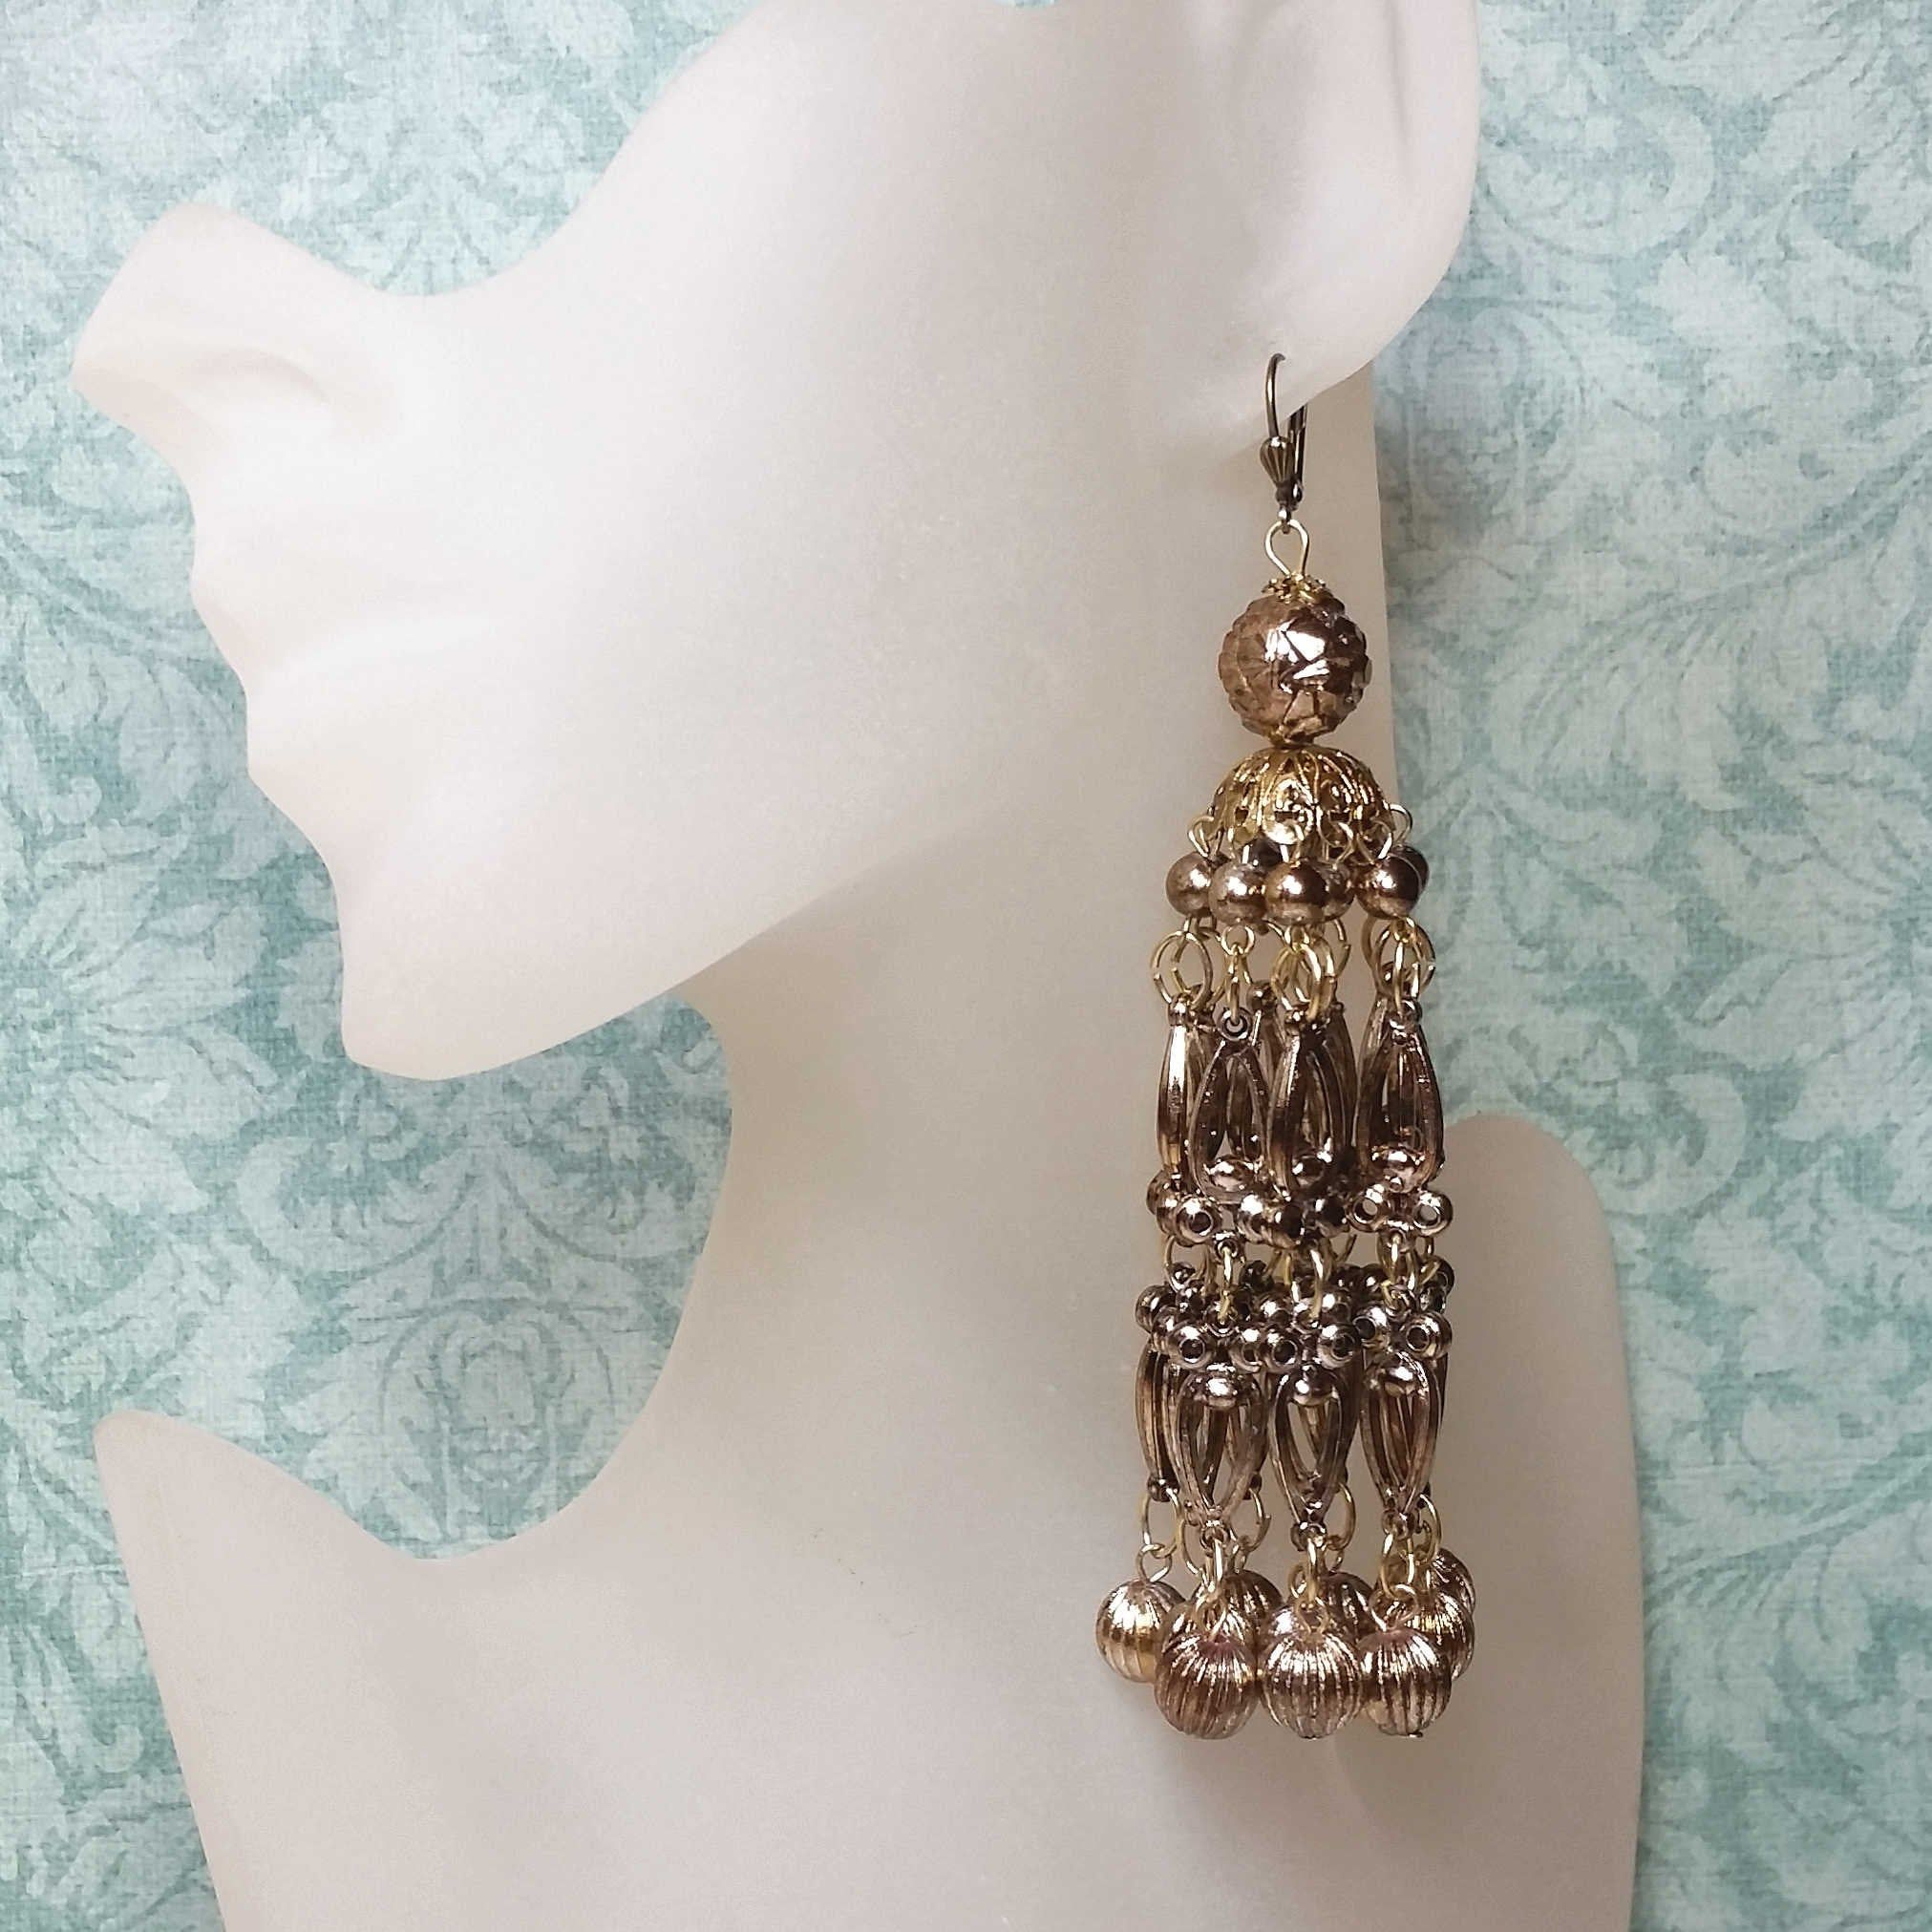 Vintage Glass Crystals earrings  Chandelier  Bohemian Style.